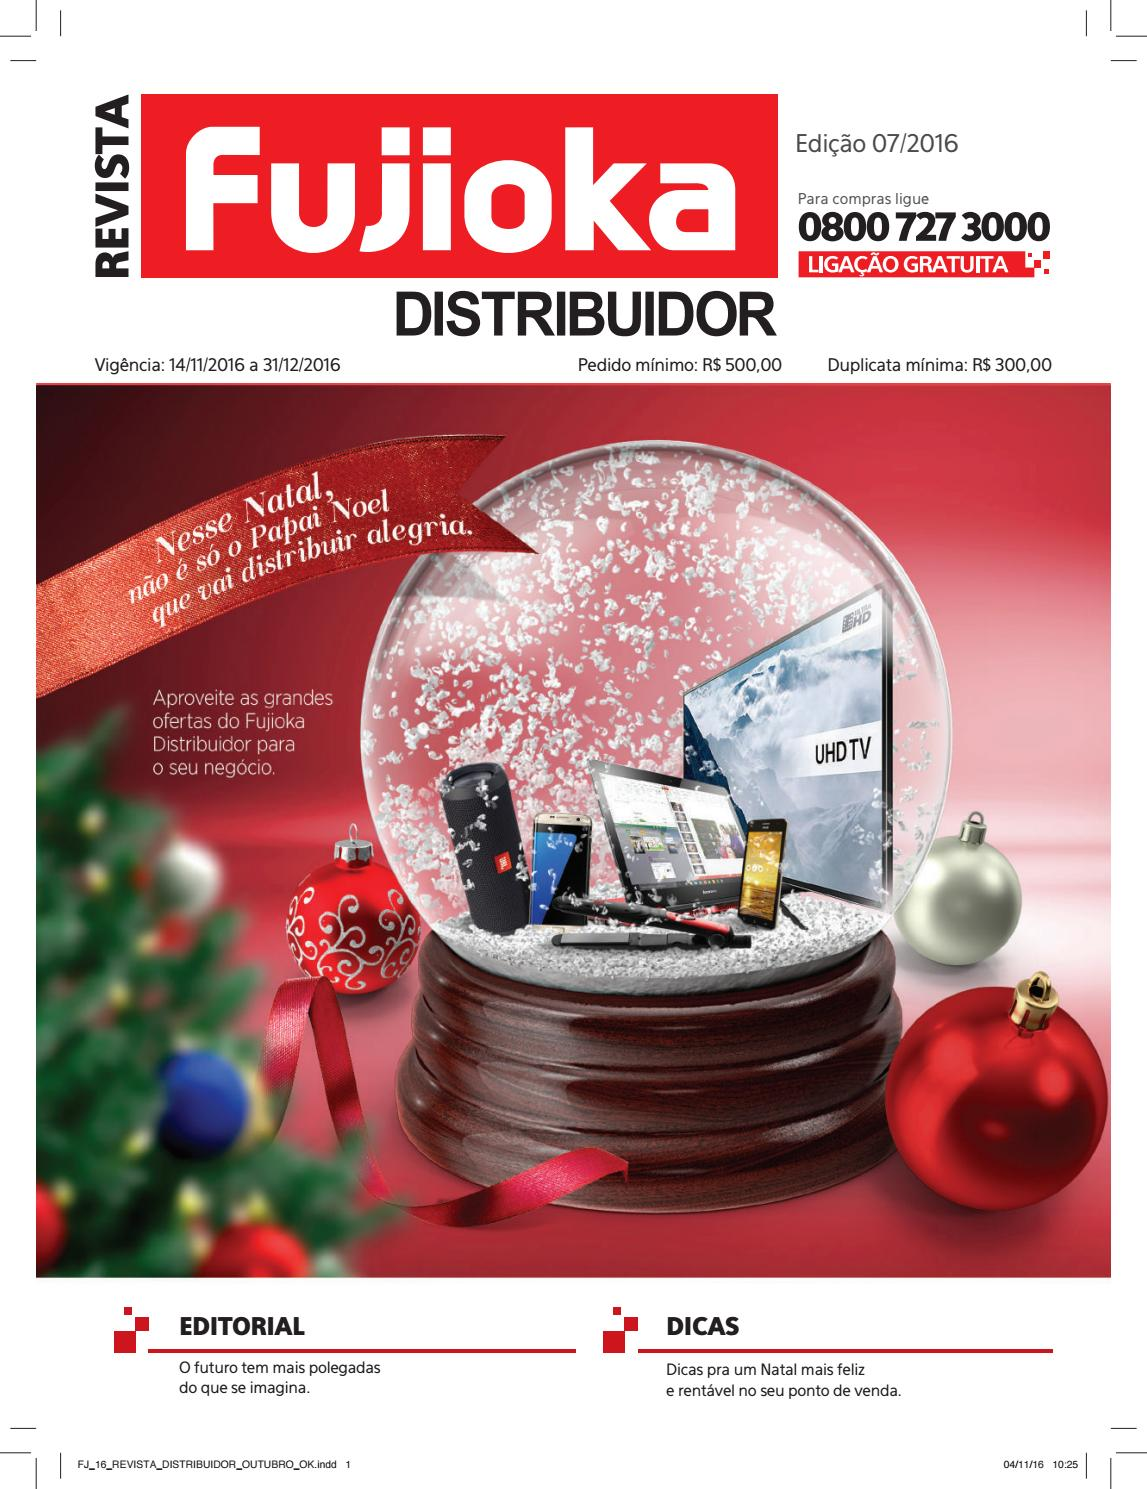 833cbea88b11d Revista Fujioka Distribuidor - 7ª Ed. by Fujioka Distribuidor - issuu